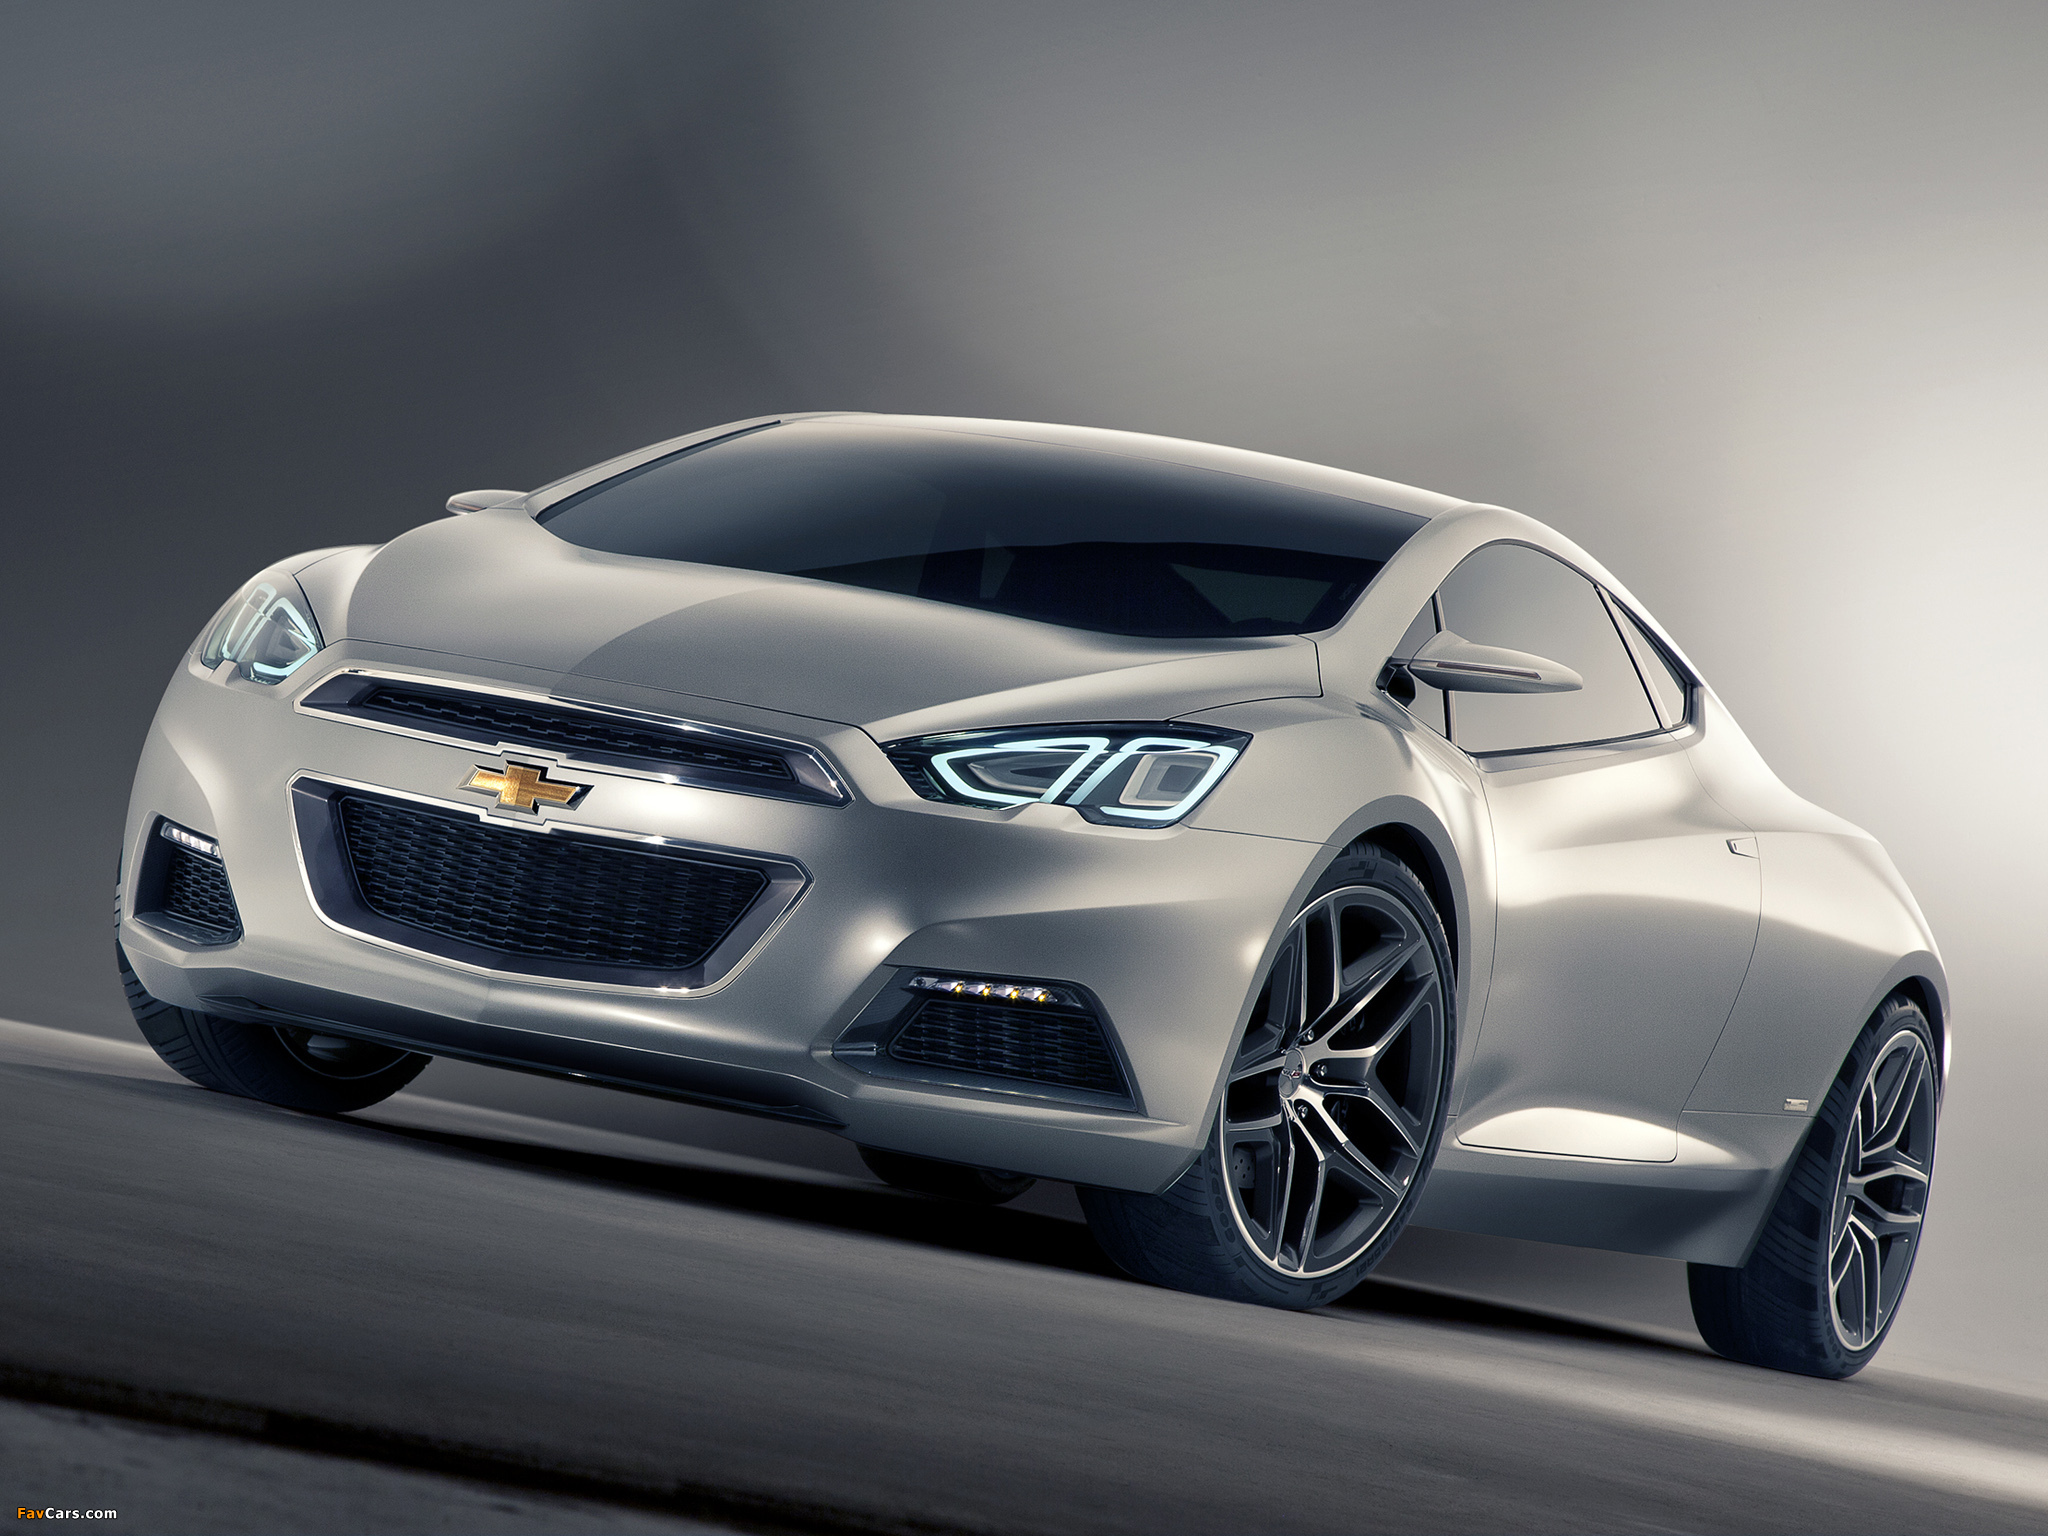 Chevrolet Tru 140S Concept 2012 pictures (2048 x 1536)